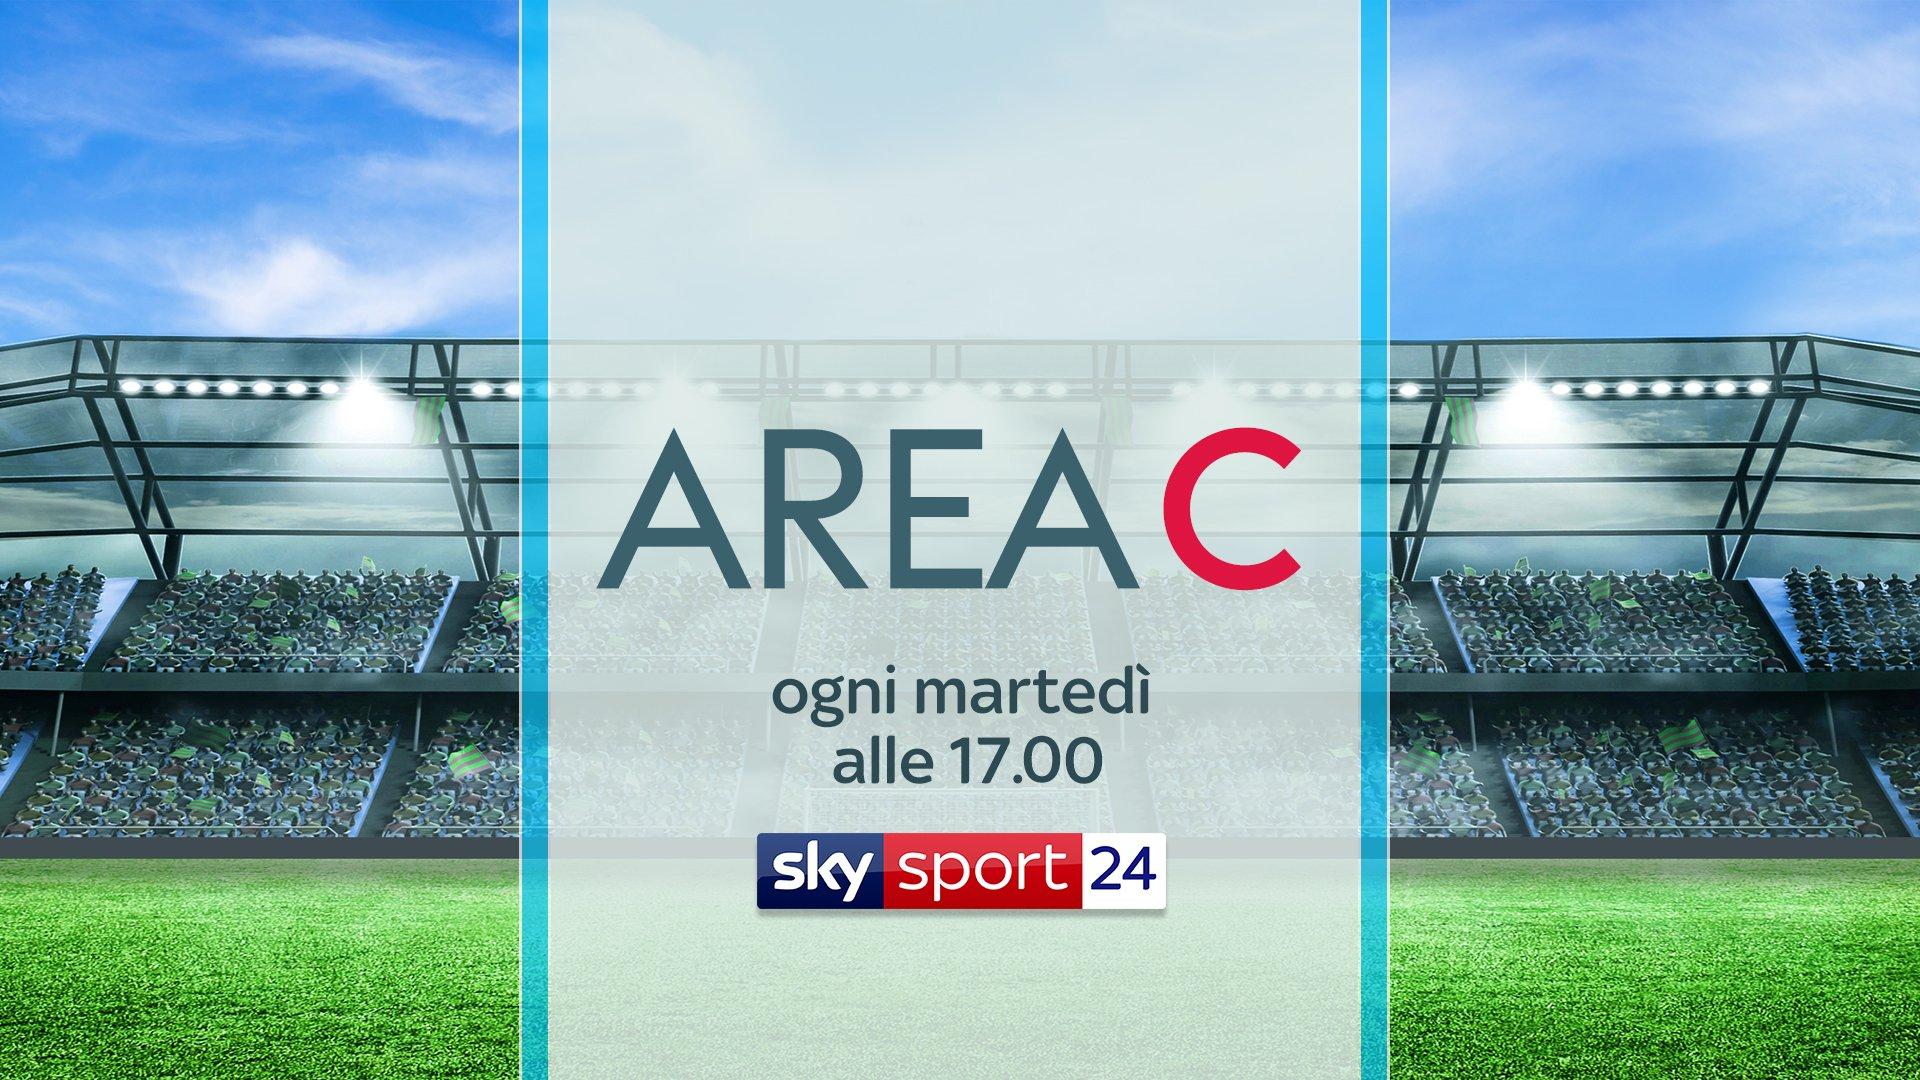 AreaC, ogni martedi su Sky Sport 24 approfondimento sulla Lega Pro